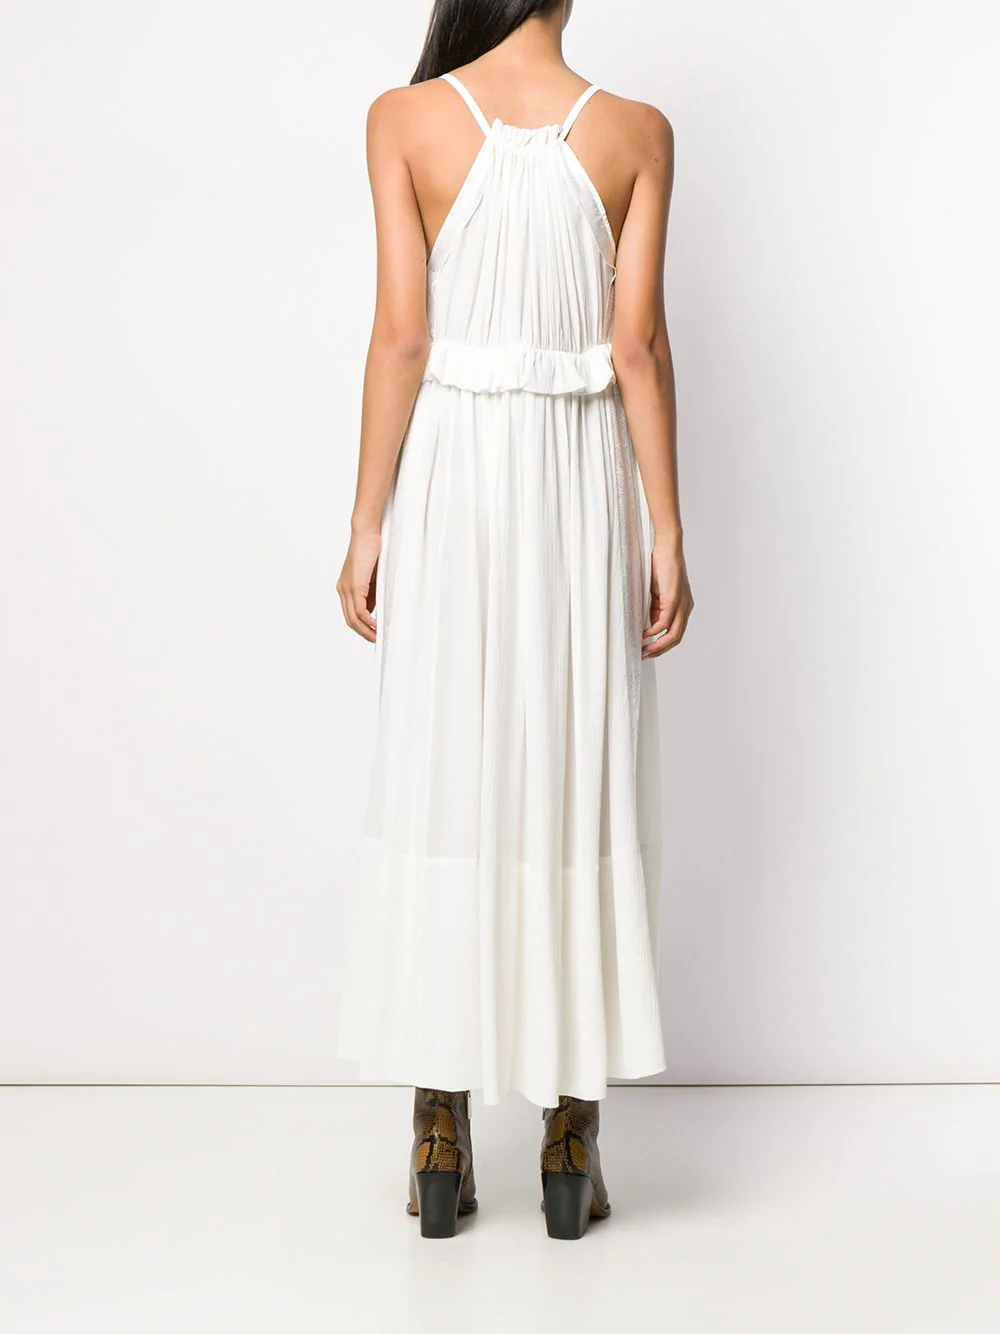 Chloe Ruffled Waist Dress Farfetch Dresses Waist Dress White Midi Dress [ 1334 x 1000 Pixel ]